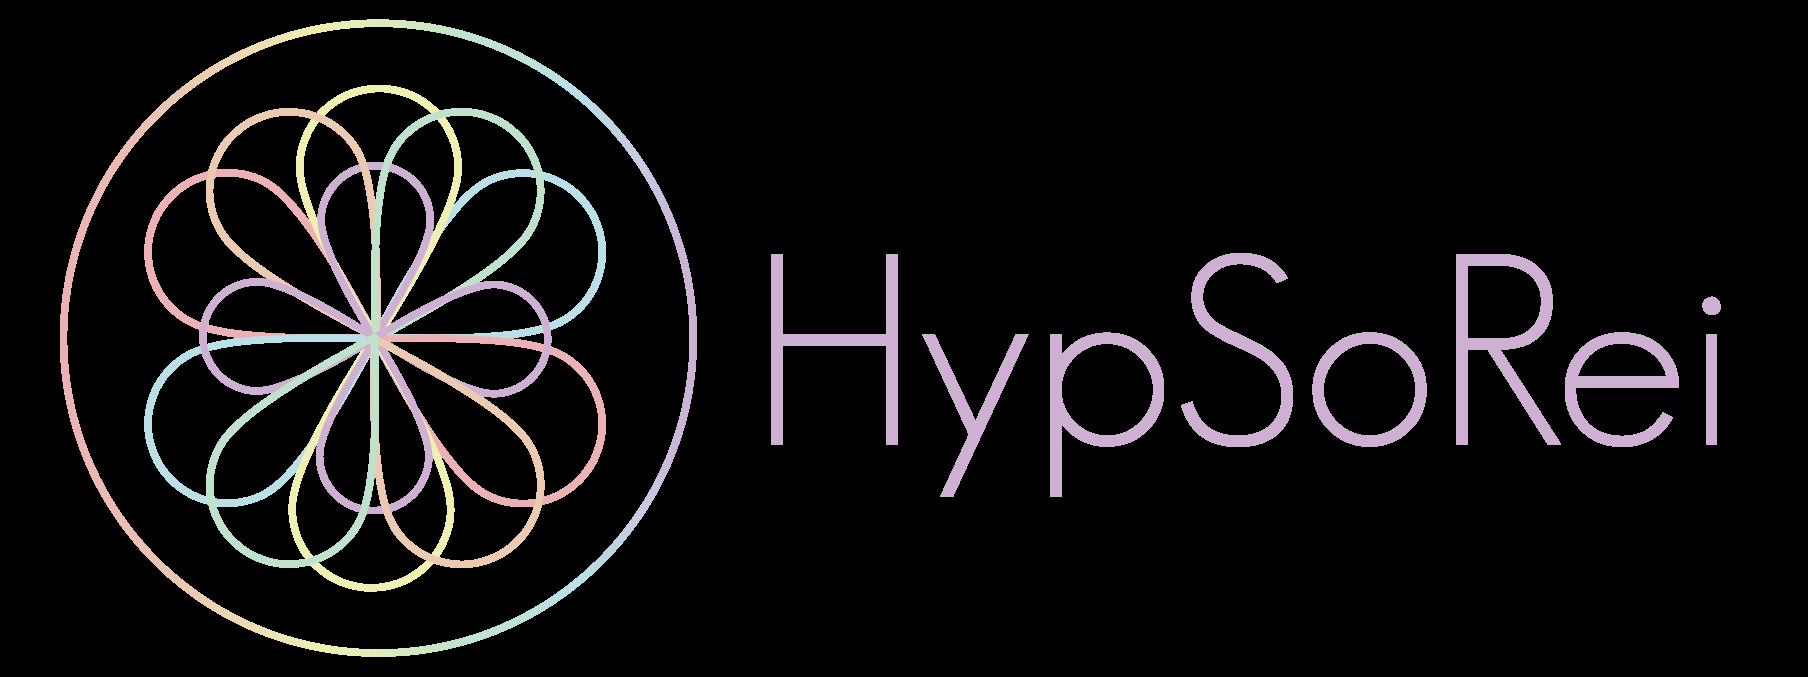 Hypsorei